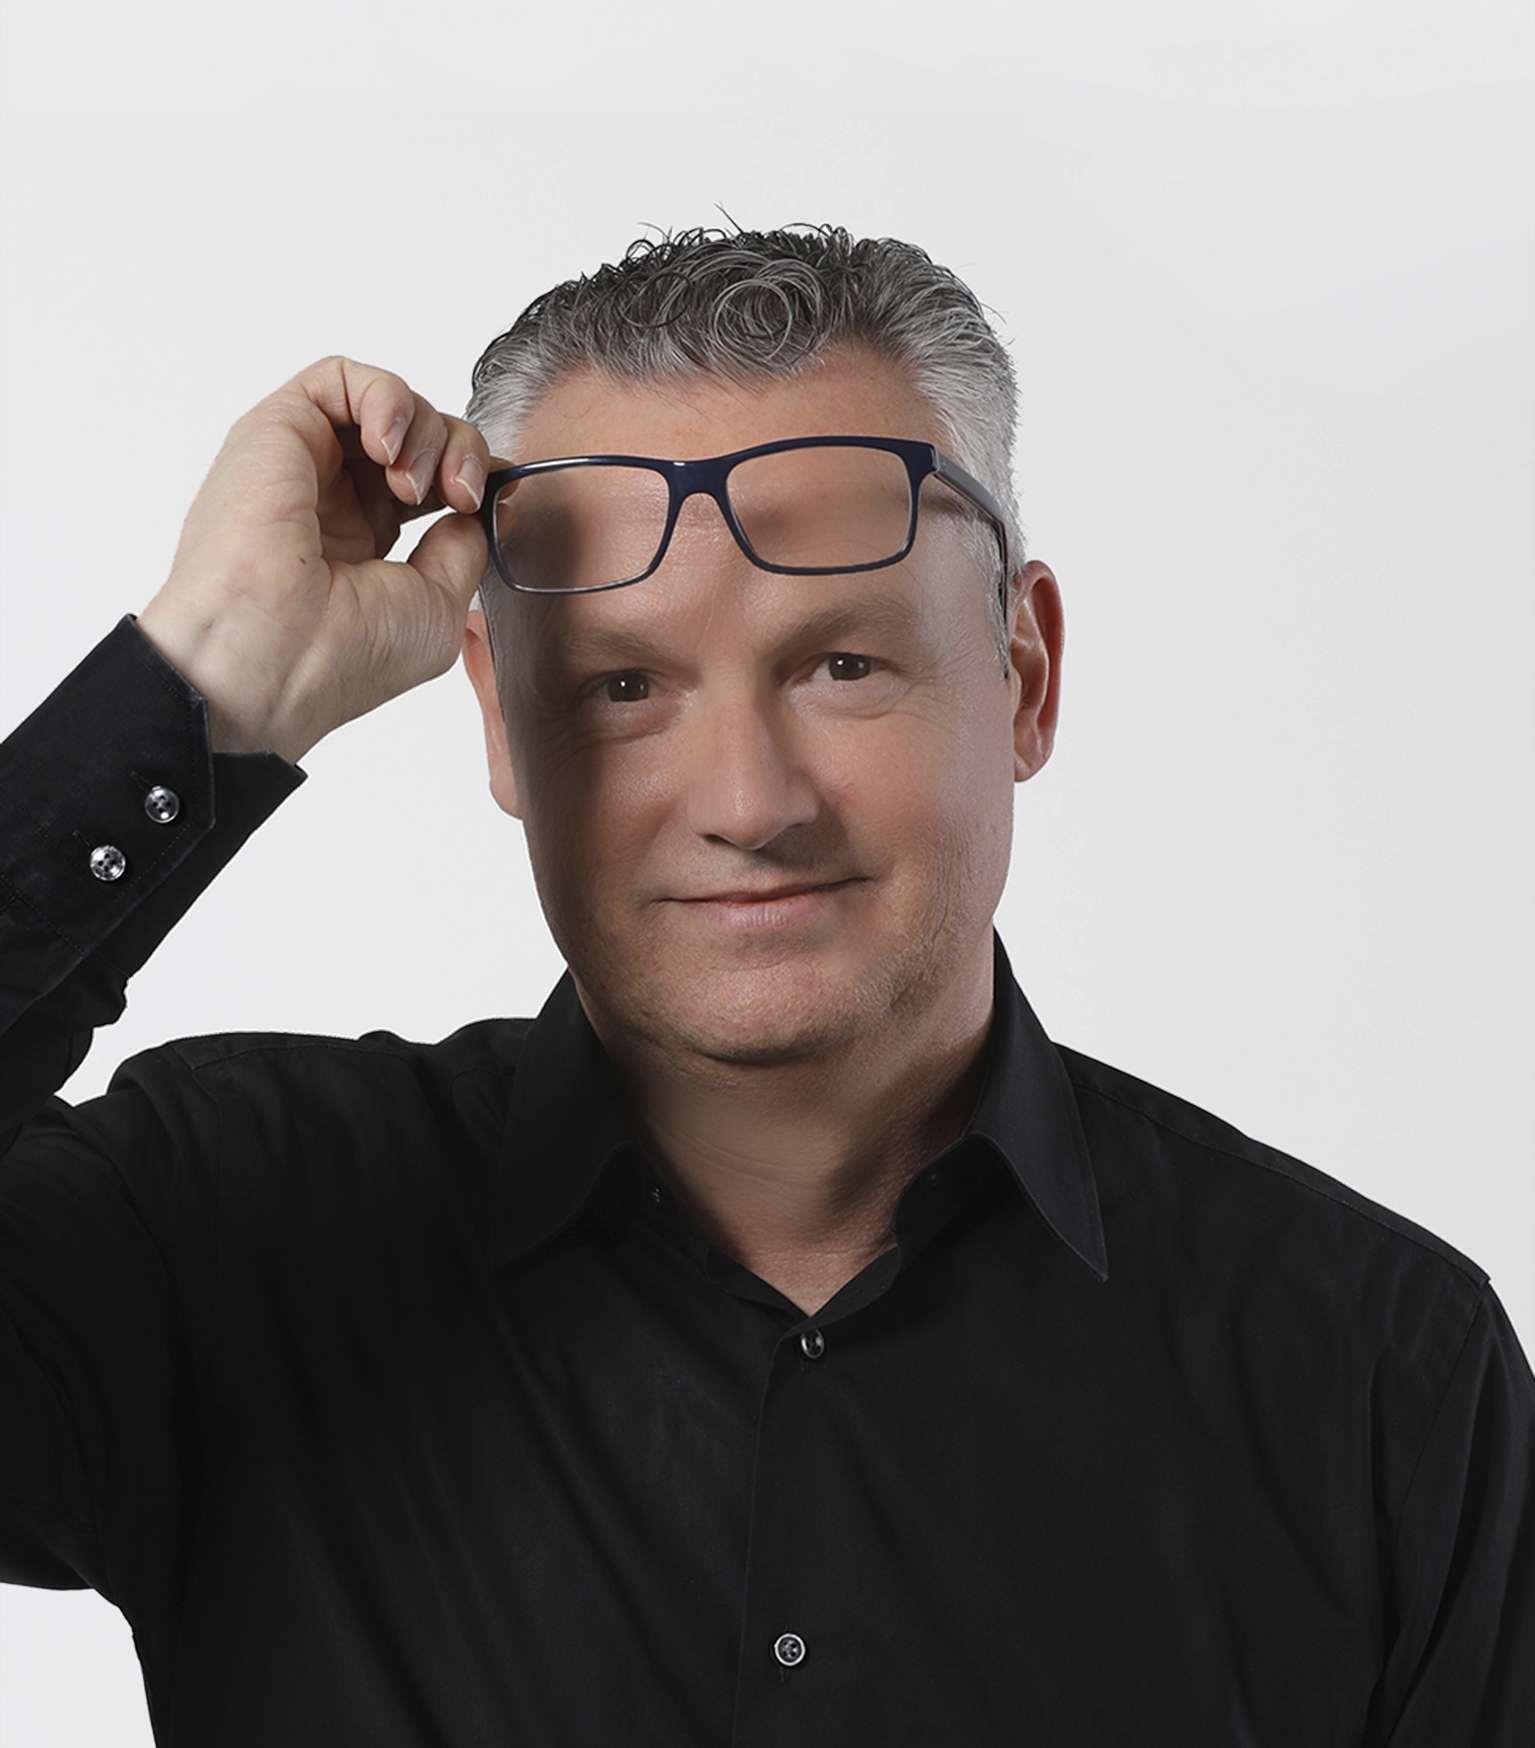 Michael Jürgens